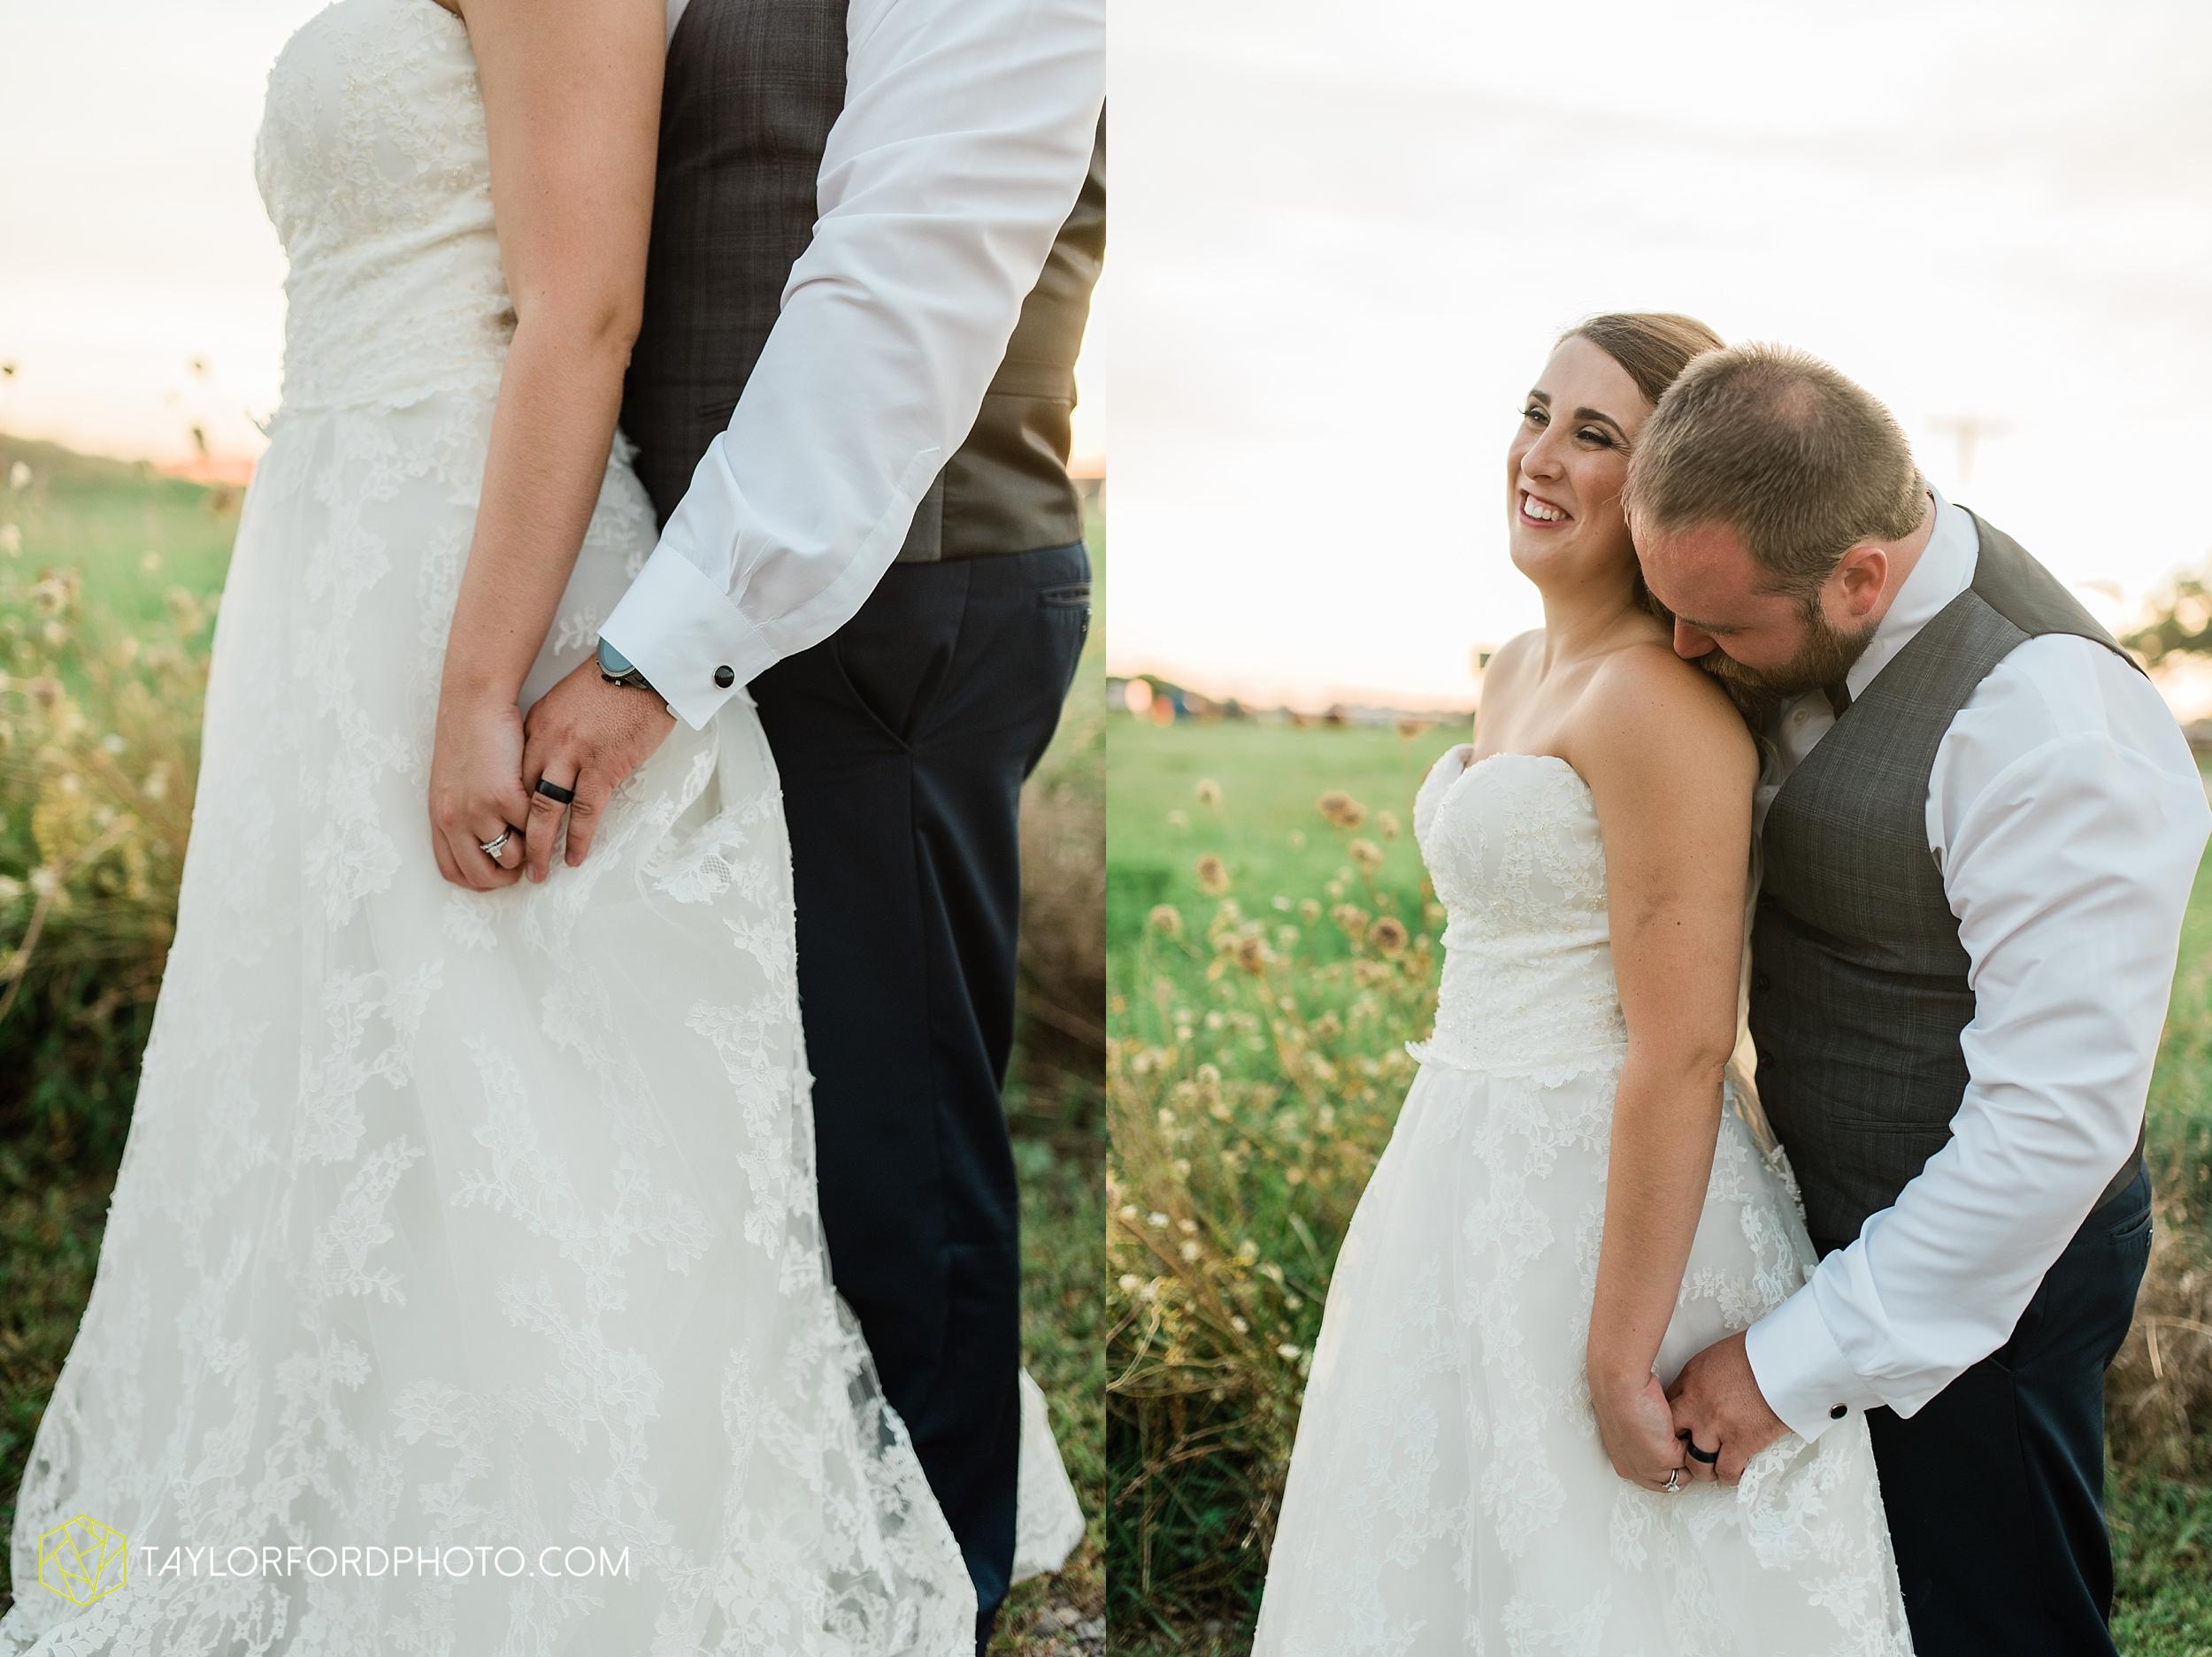 chelsey-zosh-jackson-young-first-united-methodist-church-senior-center-van-wert-ohio-wedding-photographer-taylor-ford-photography_0103.jpg